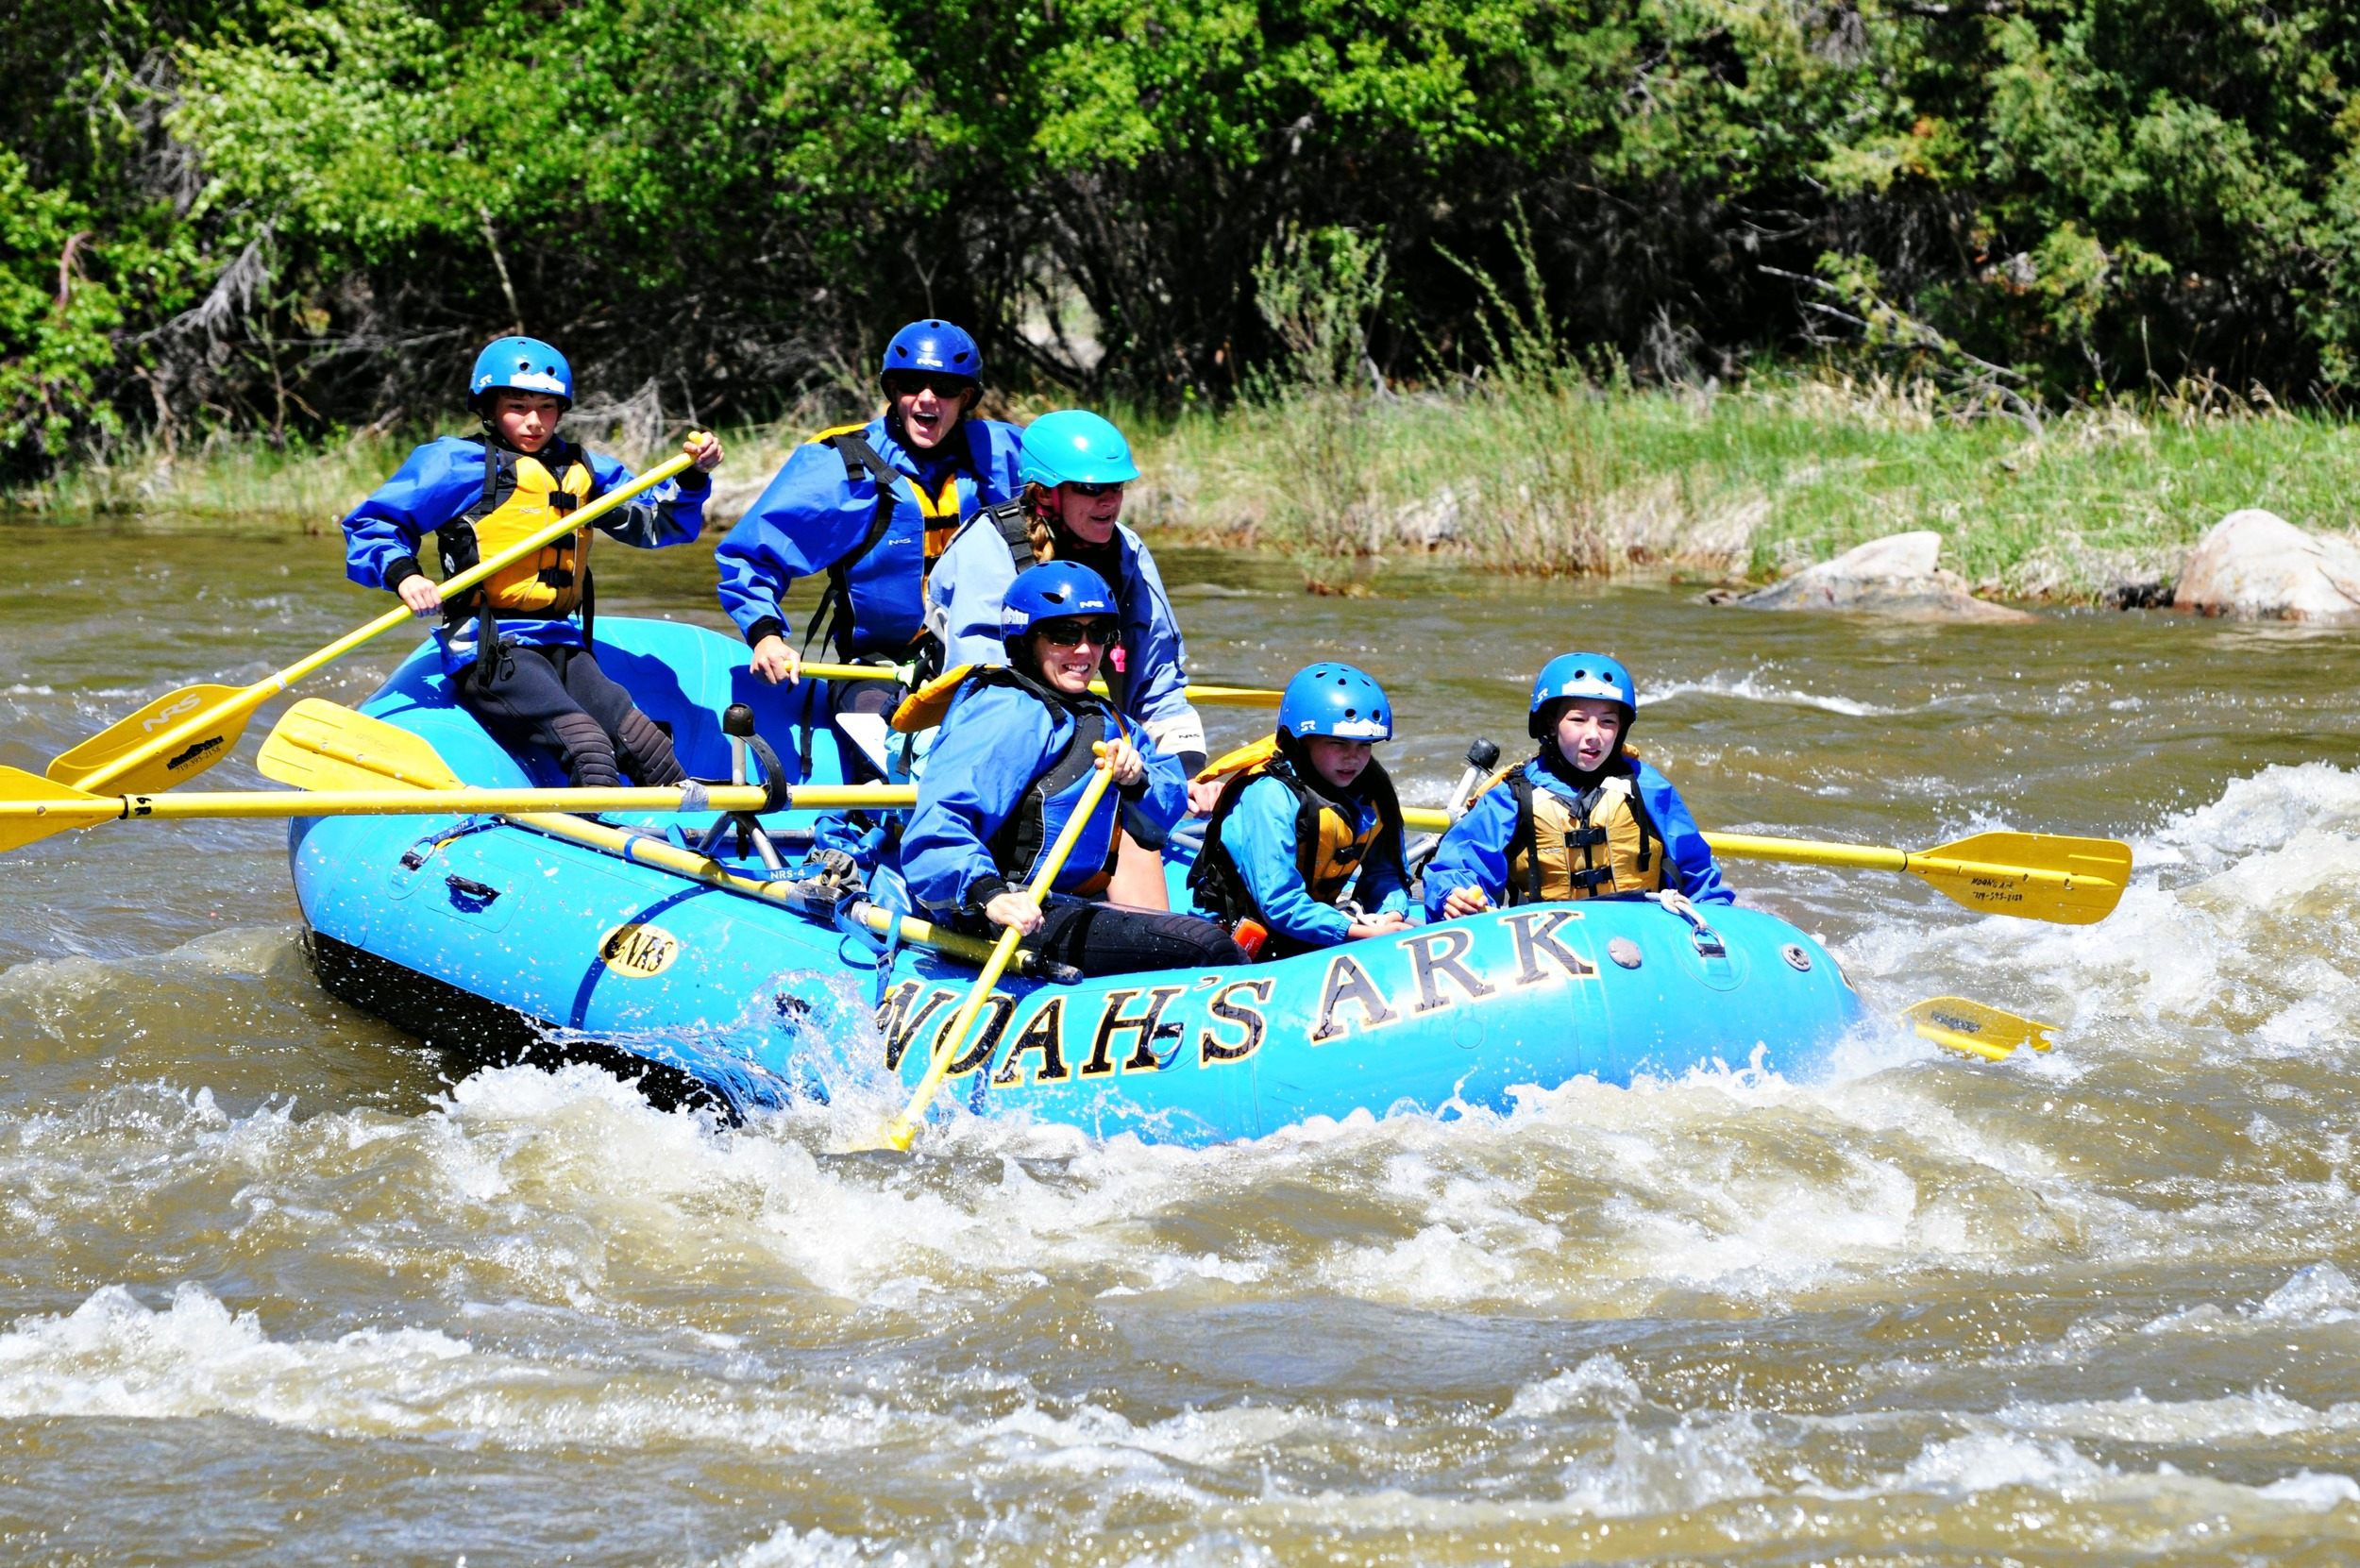 noahs-ark-whitewater-rafting-colorado